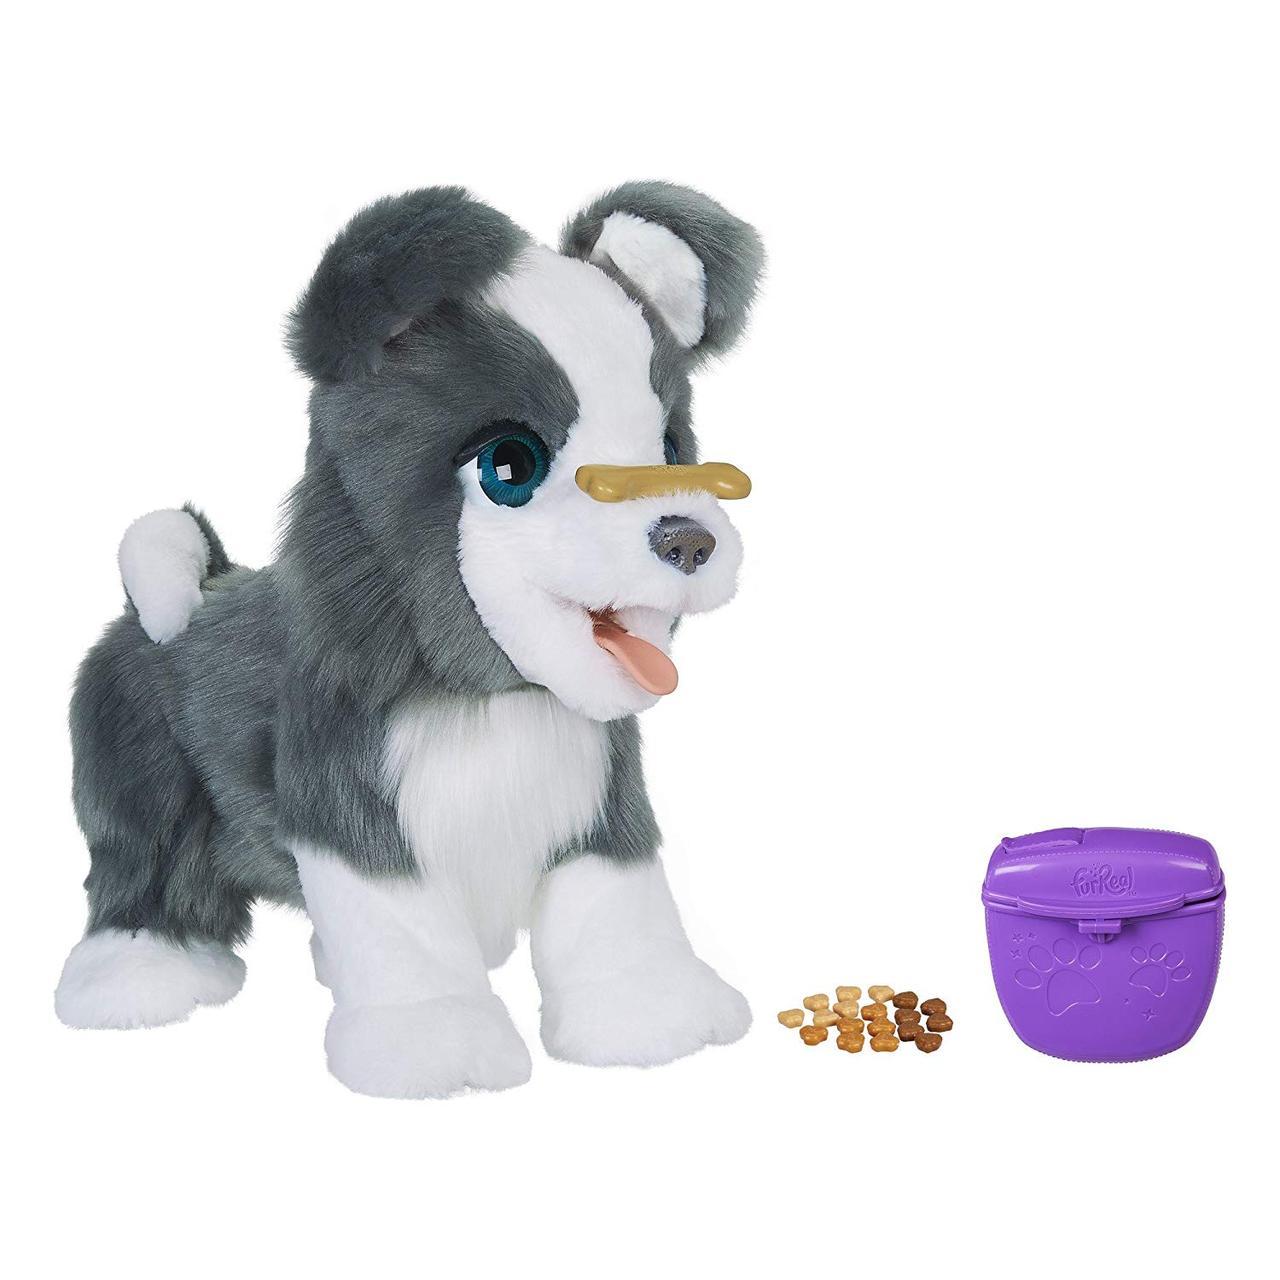 Интерактивный щенок Рикки Фурриал Хаски Оригинал FurReal Friends Ricky, the Trick-Lovin' Pup